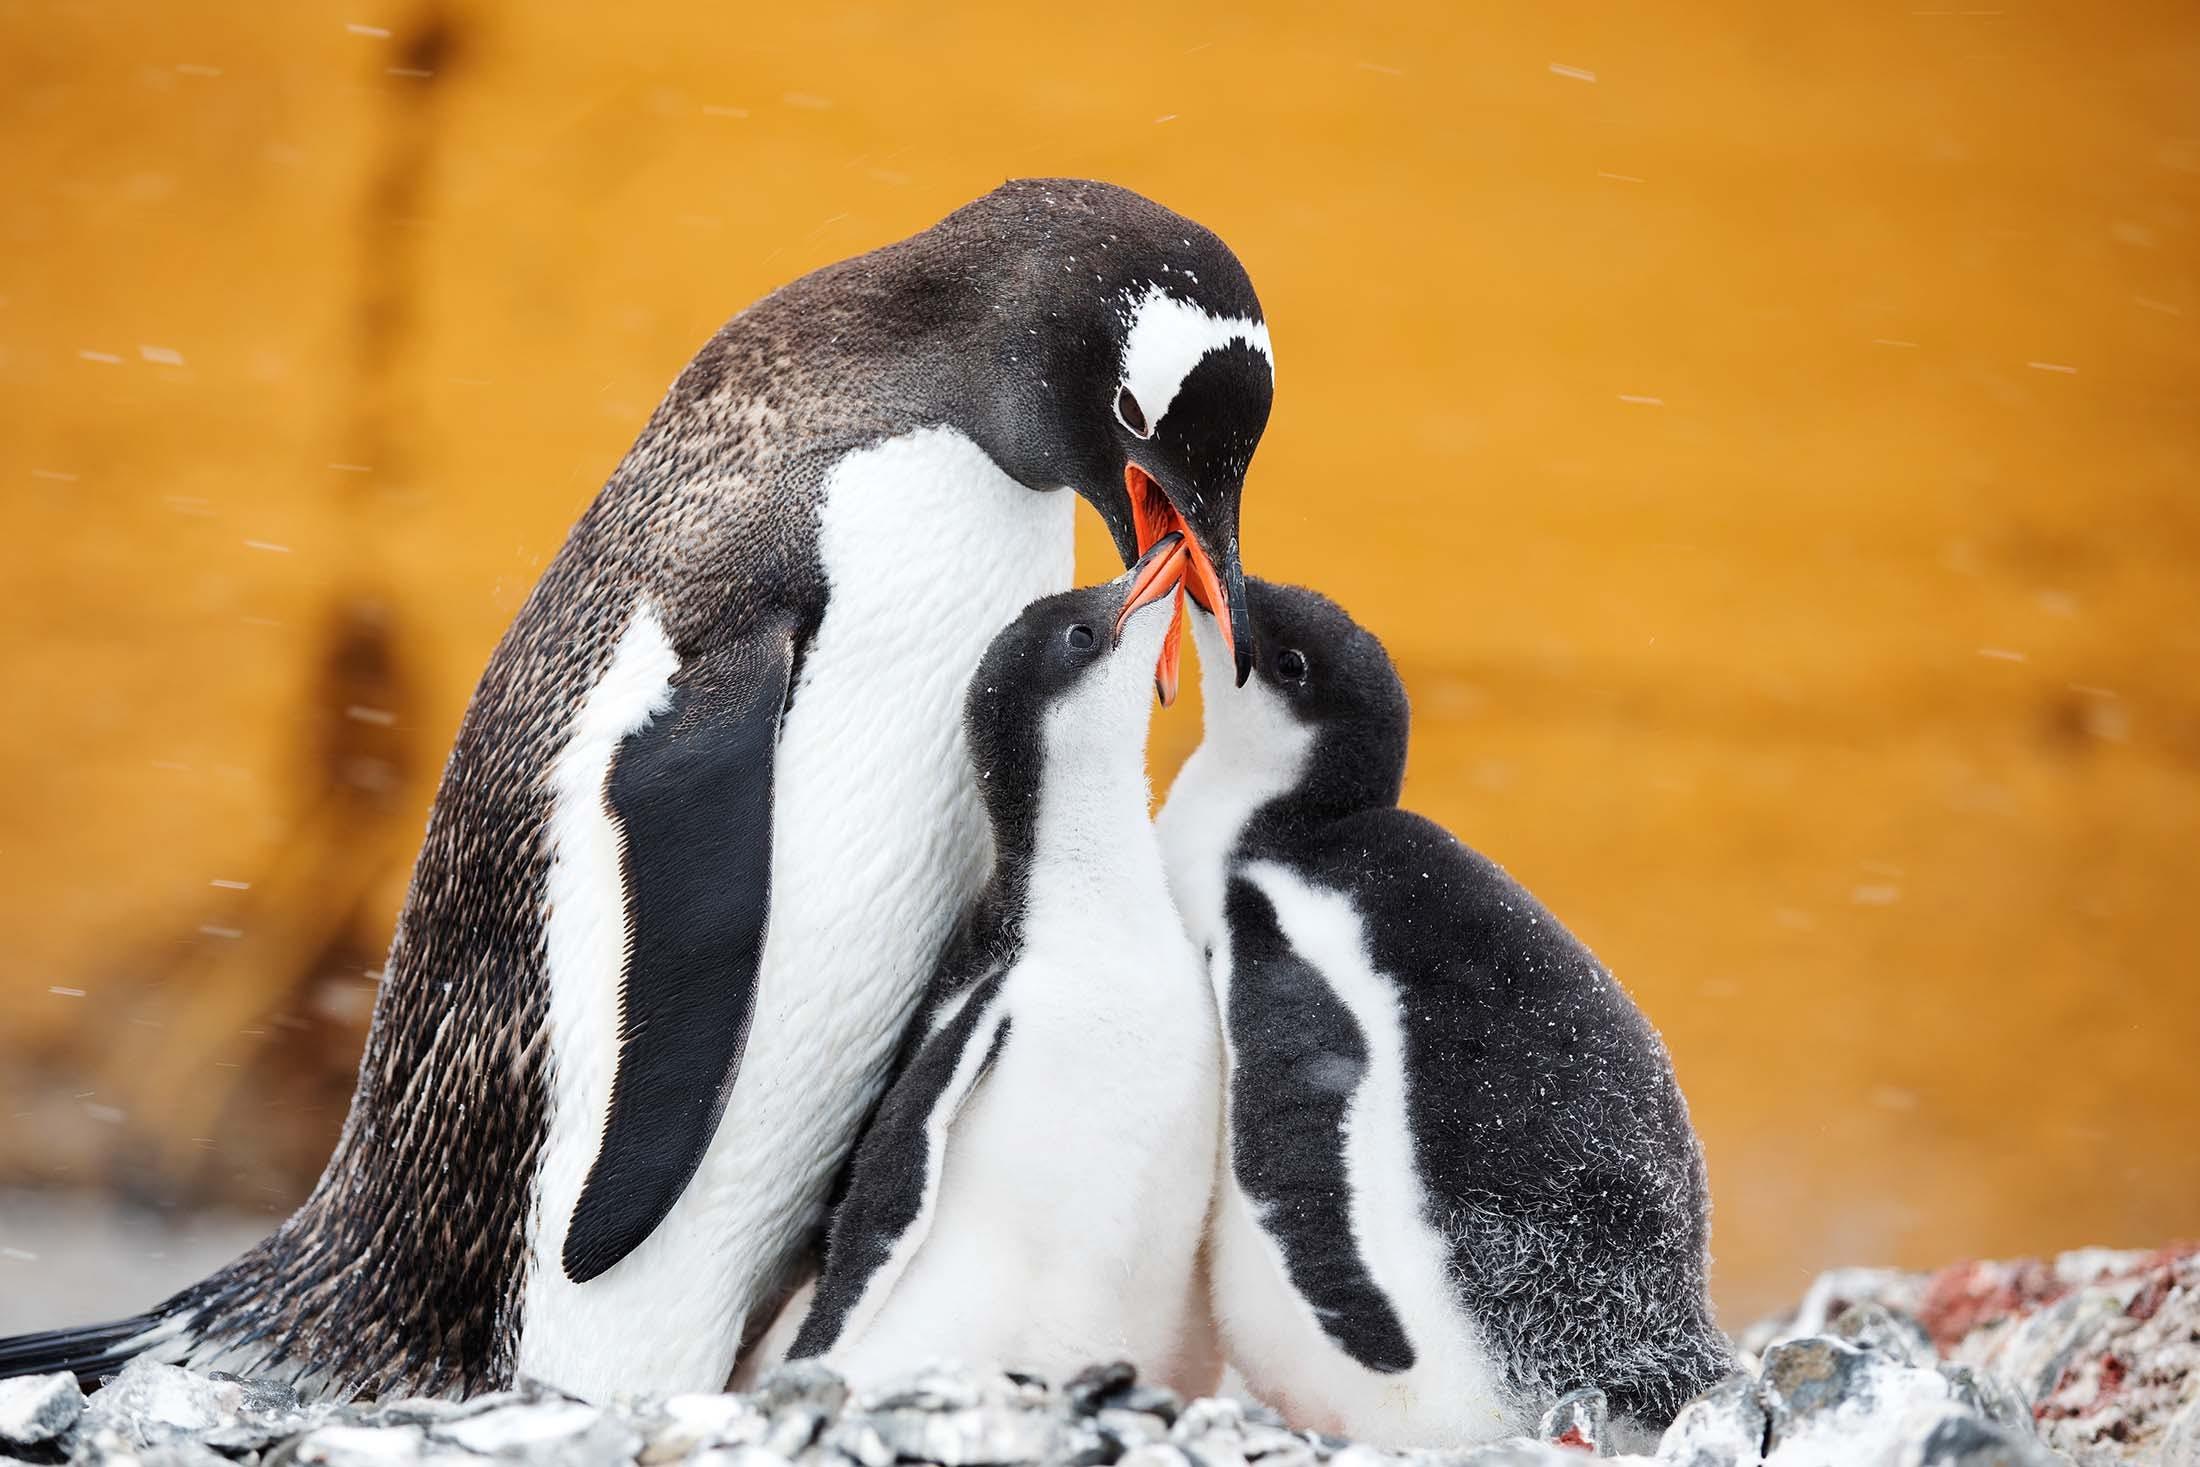 Gentoo penguins, Esperanza Station, Antarctica